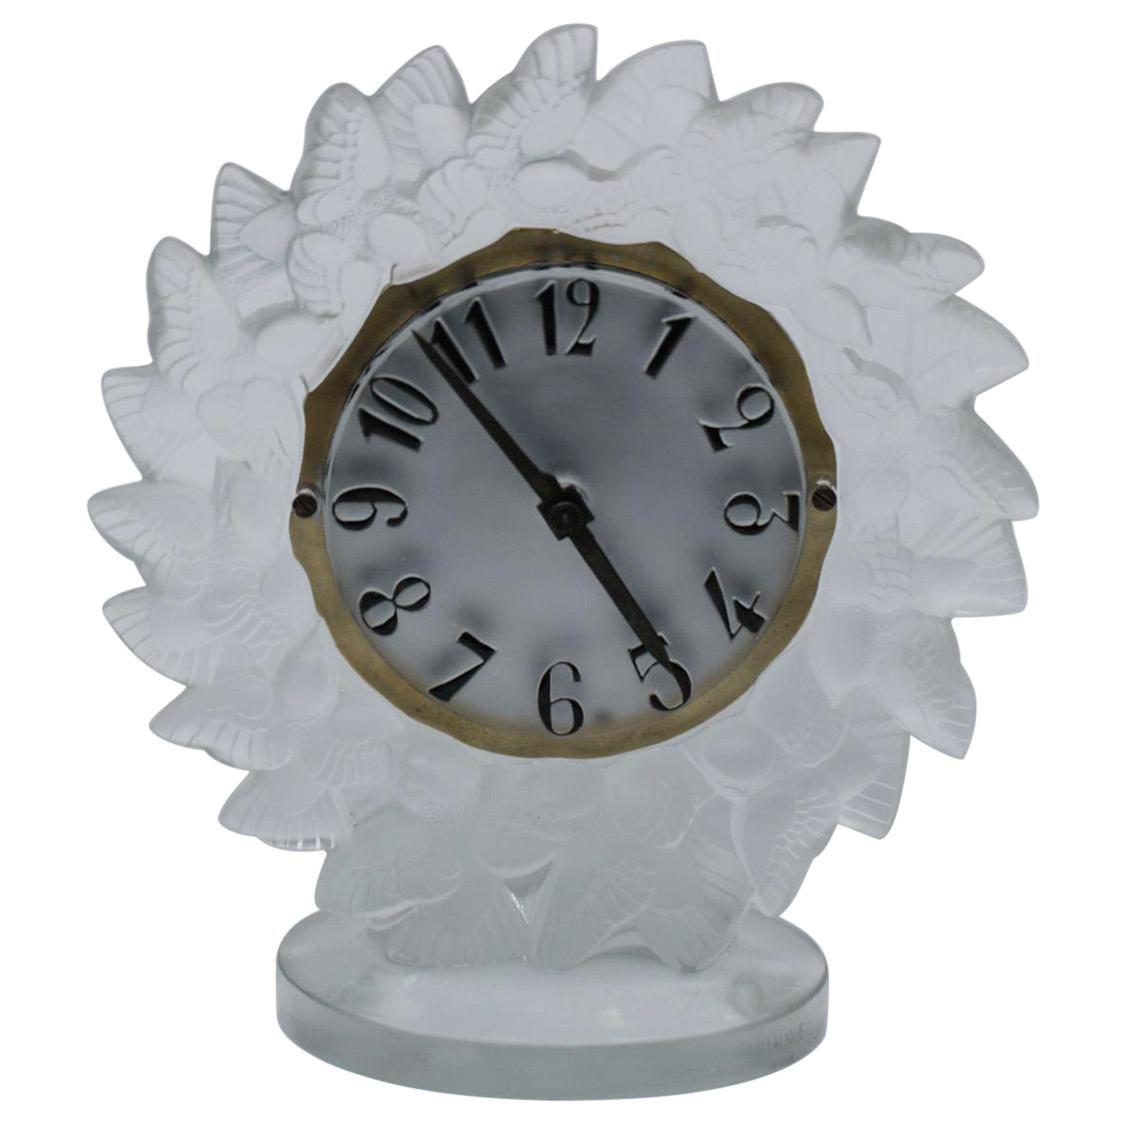 René Lalique Frosted Glass Roitelets Clock